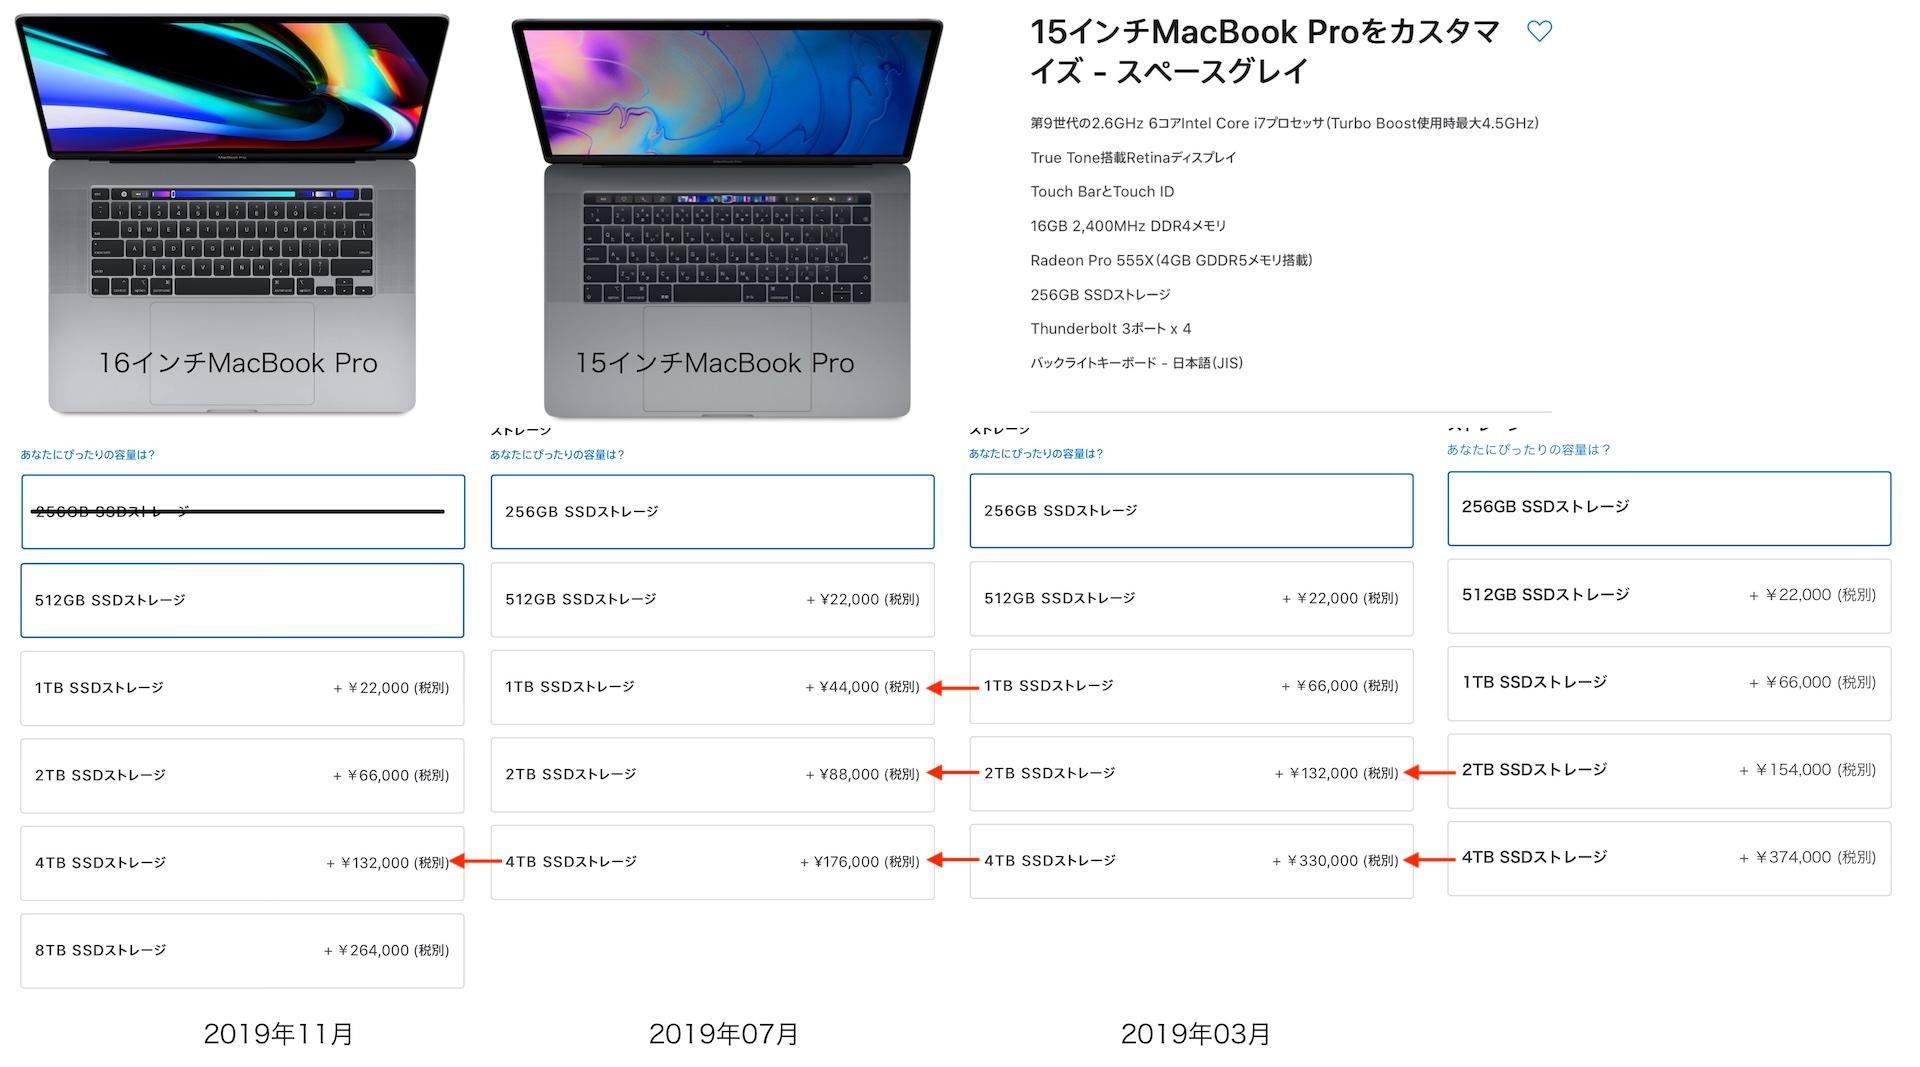 MacBook Pro (16-inch, 2019)のメモリ価格